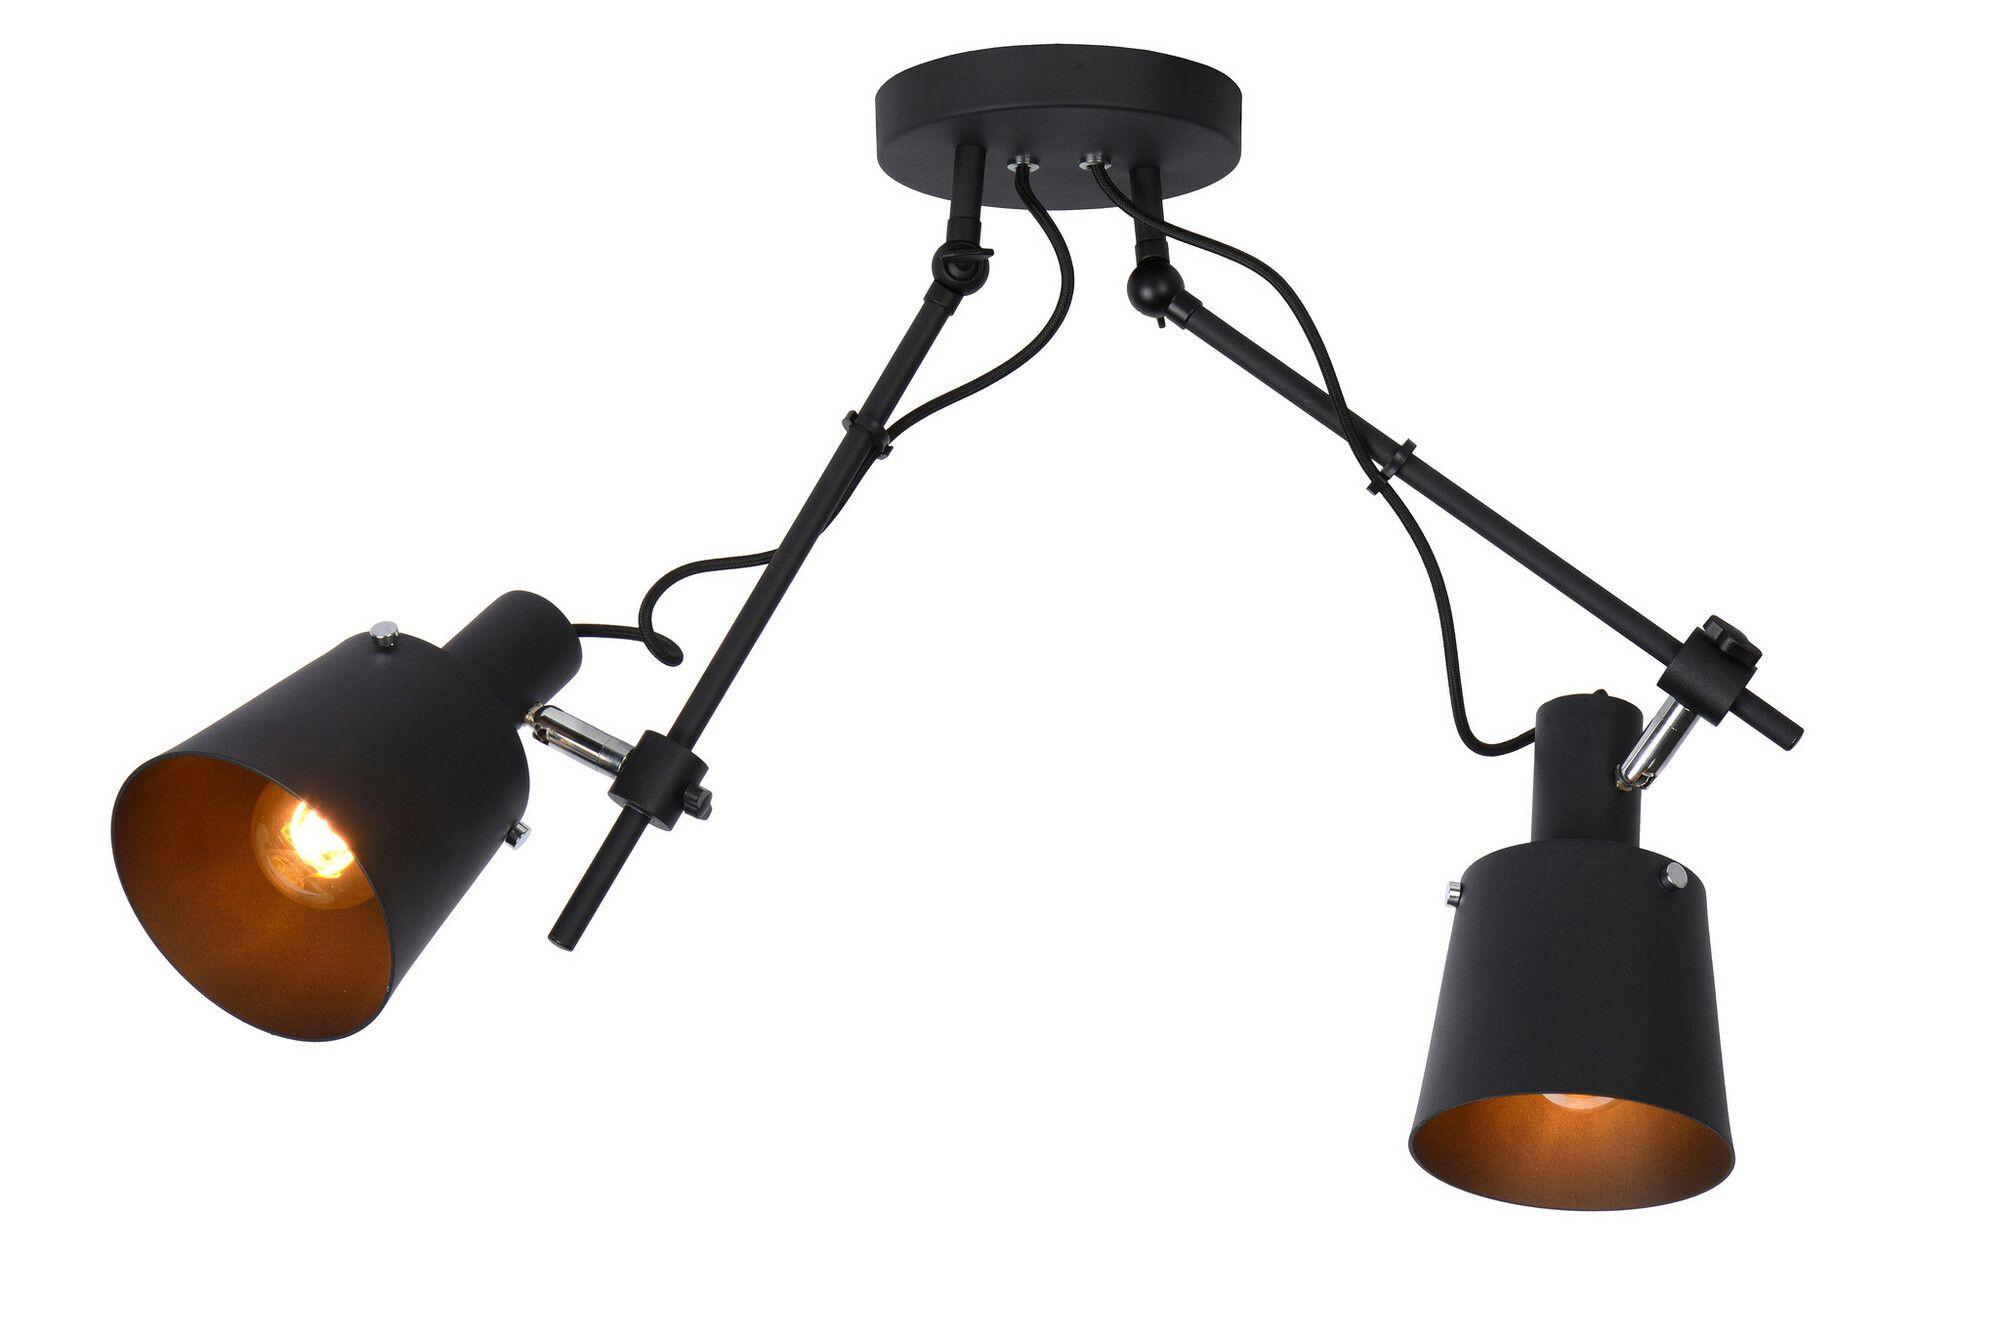 LED plafondarmaturen